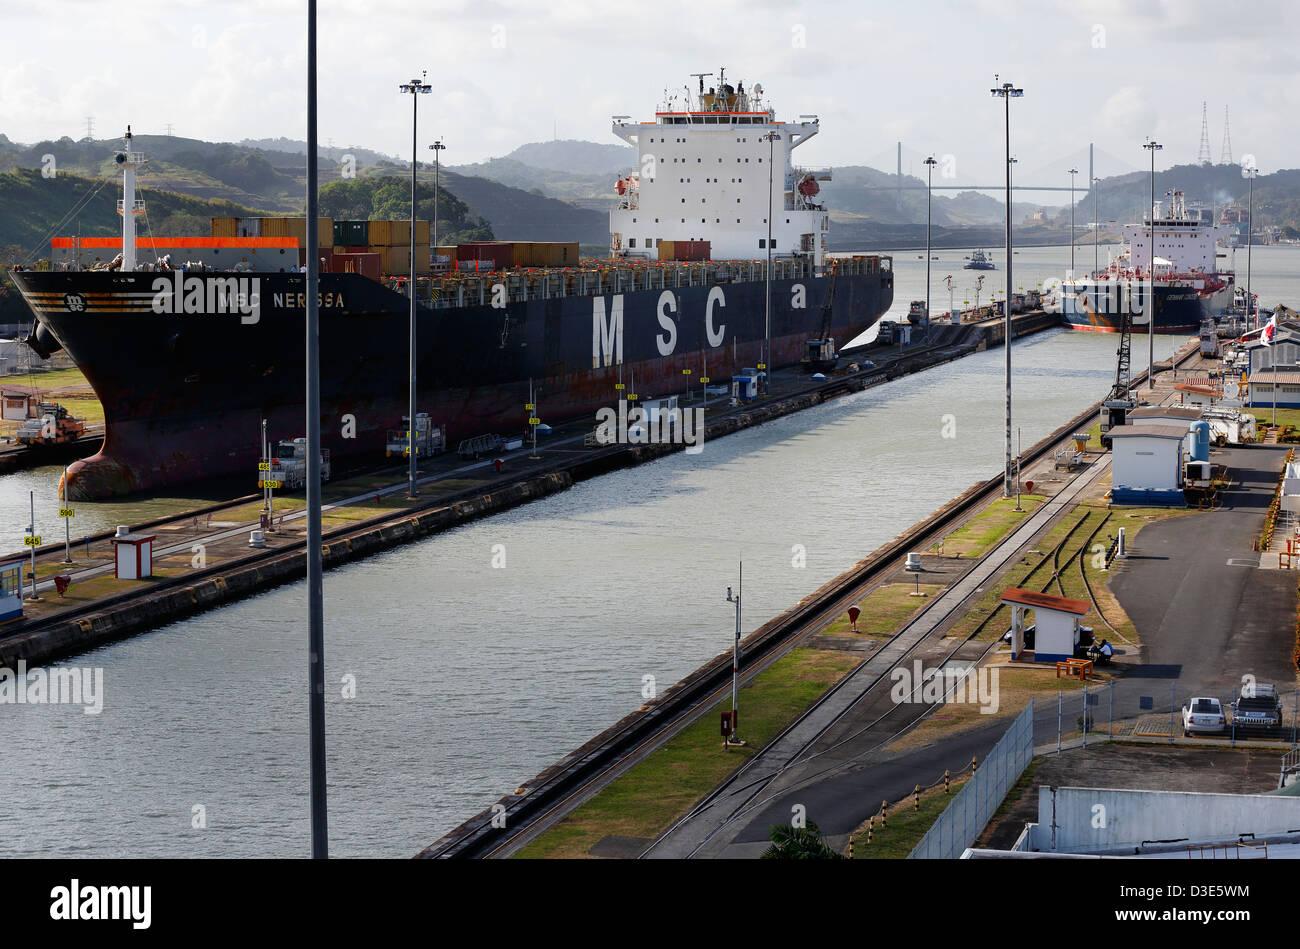 Ships entering Miraflores Locks on the Panama Canal - Stock Image